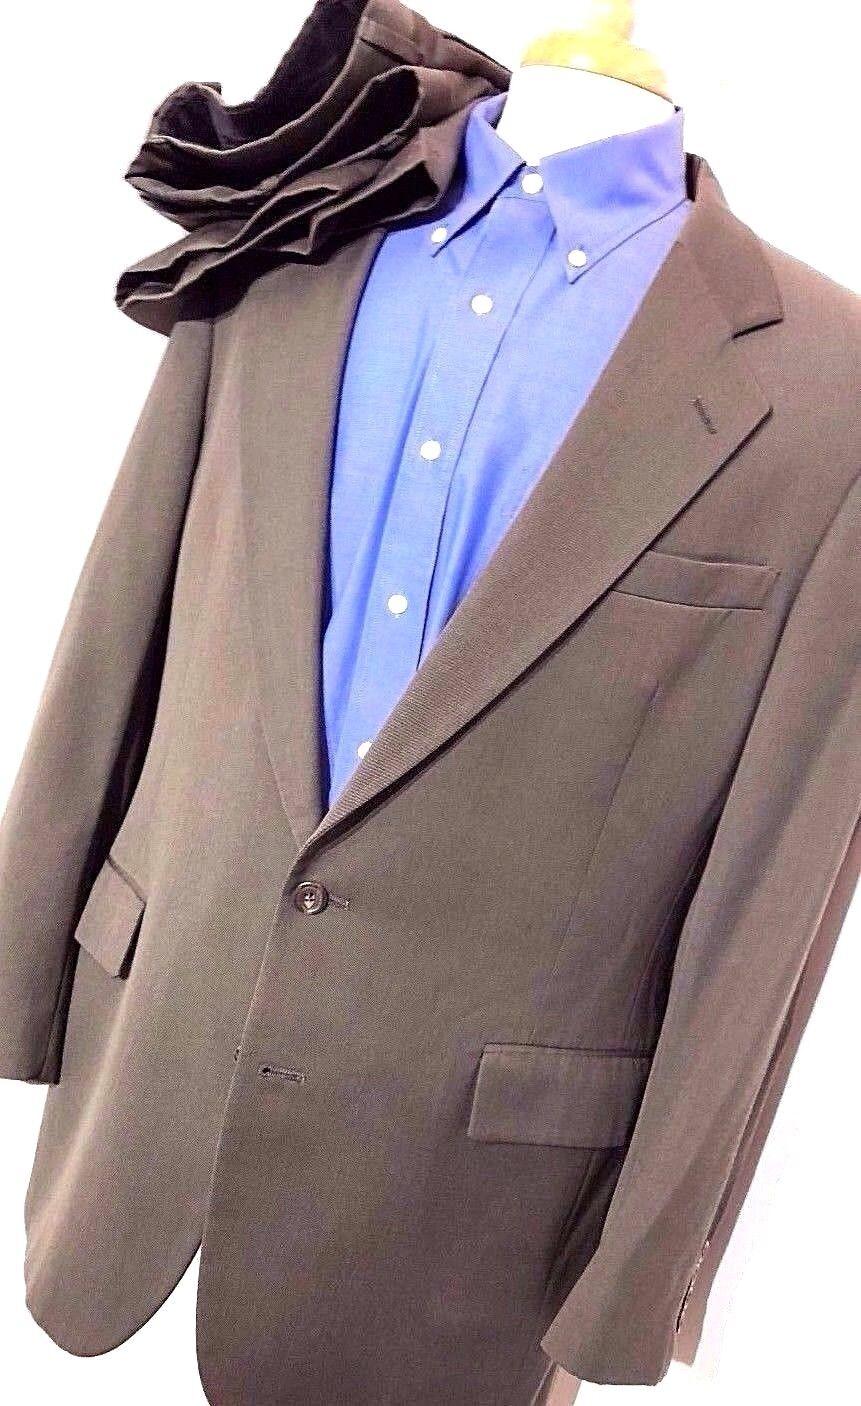 Jos. A. Bank Suit Men's 43L Long - 38 x (30.5-33) Solid Green-Olive Vented EUC